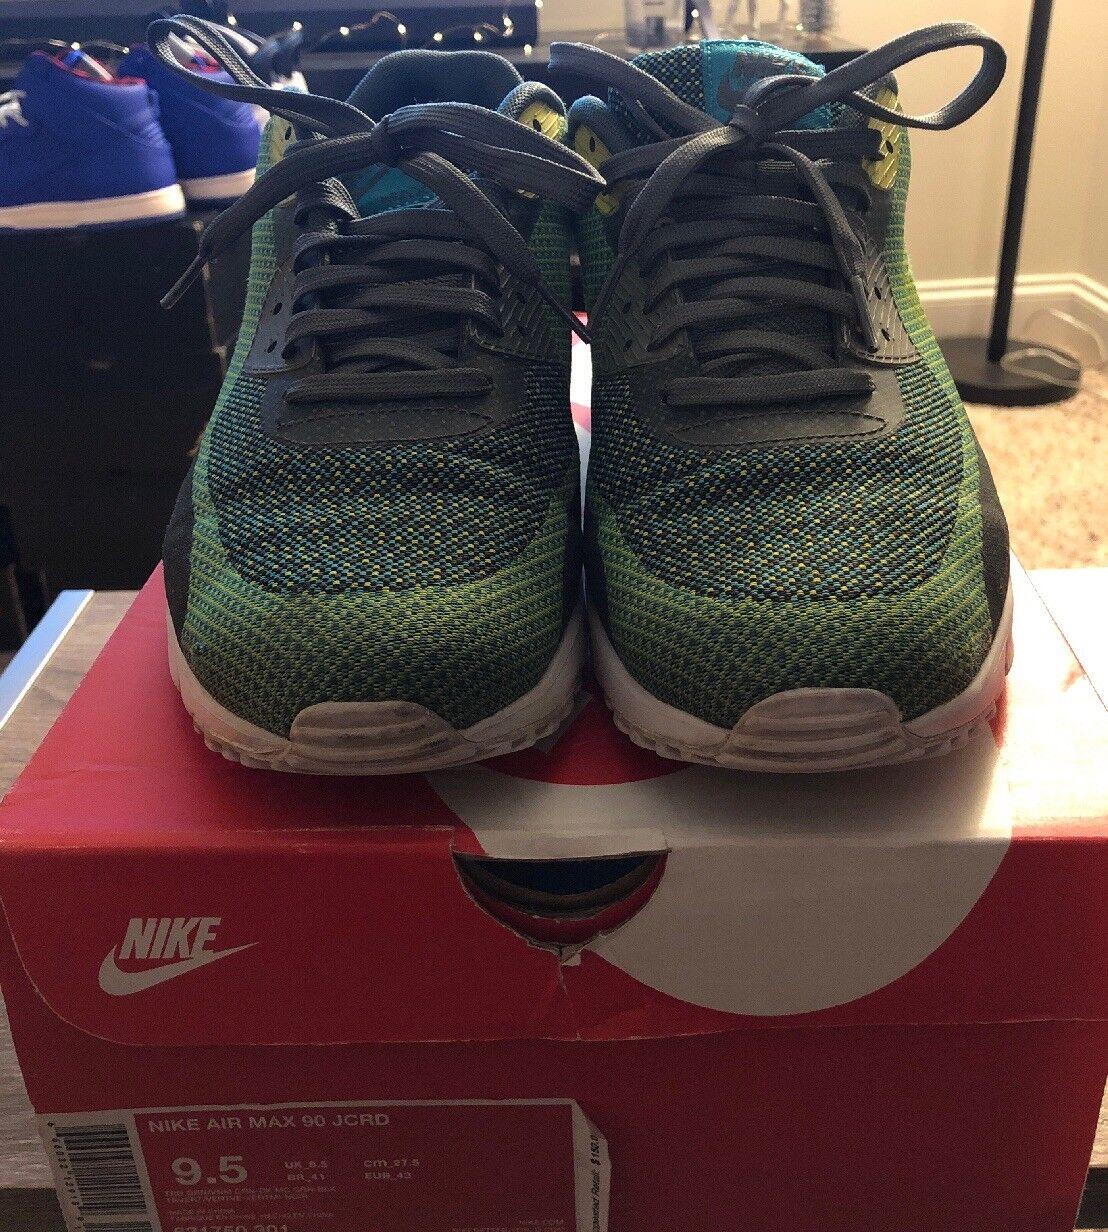 Nike Air Max 90 JCRD Size 9.5